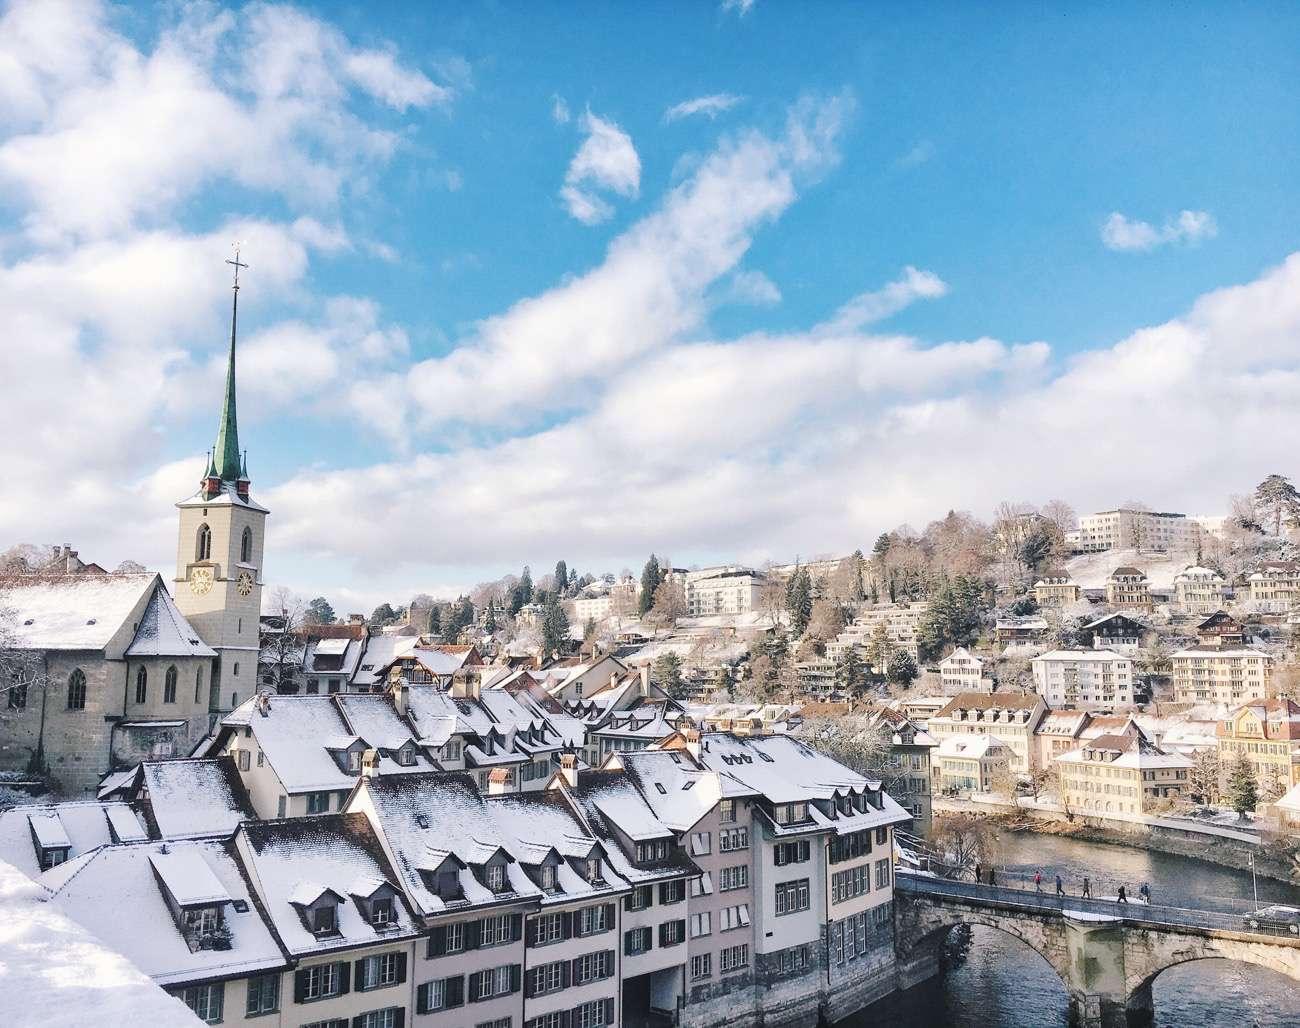 Bern Snow Capped